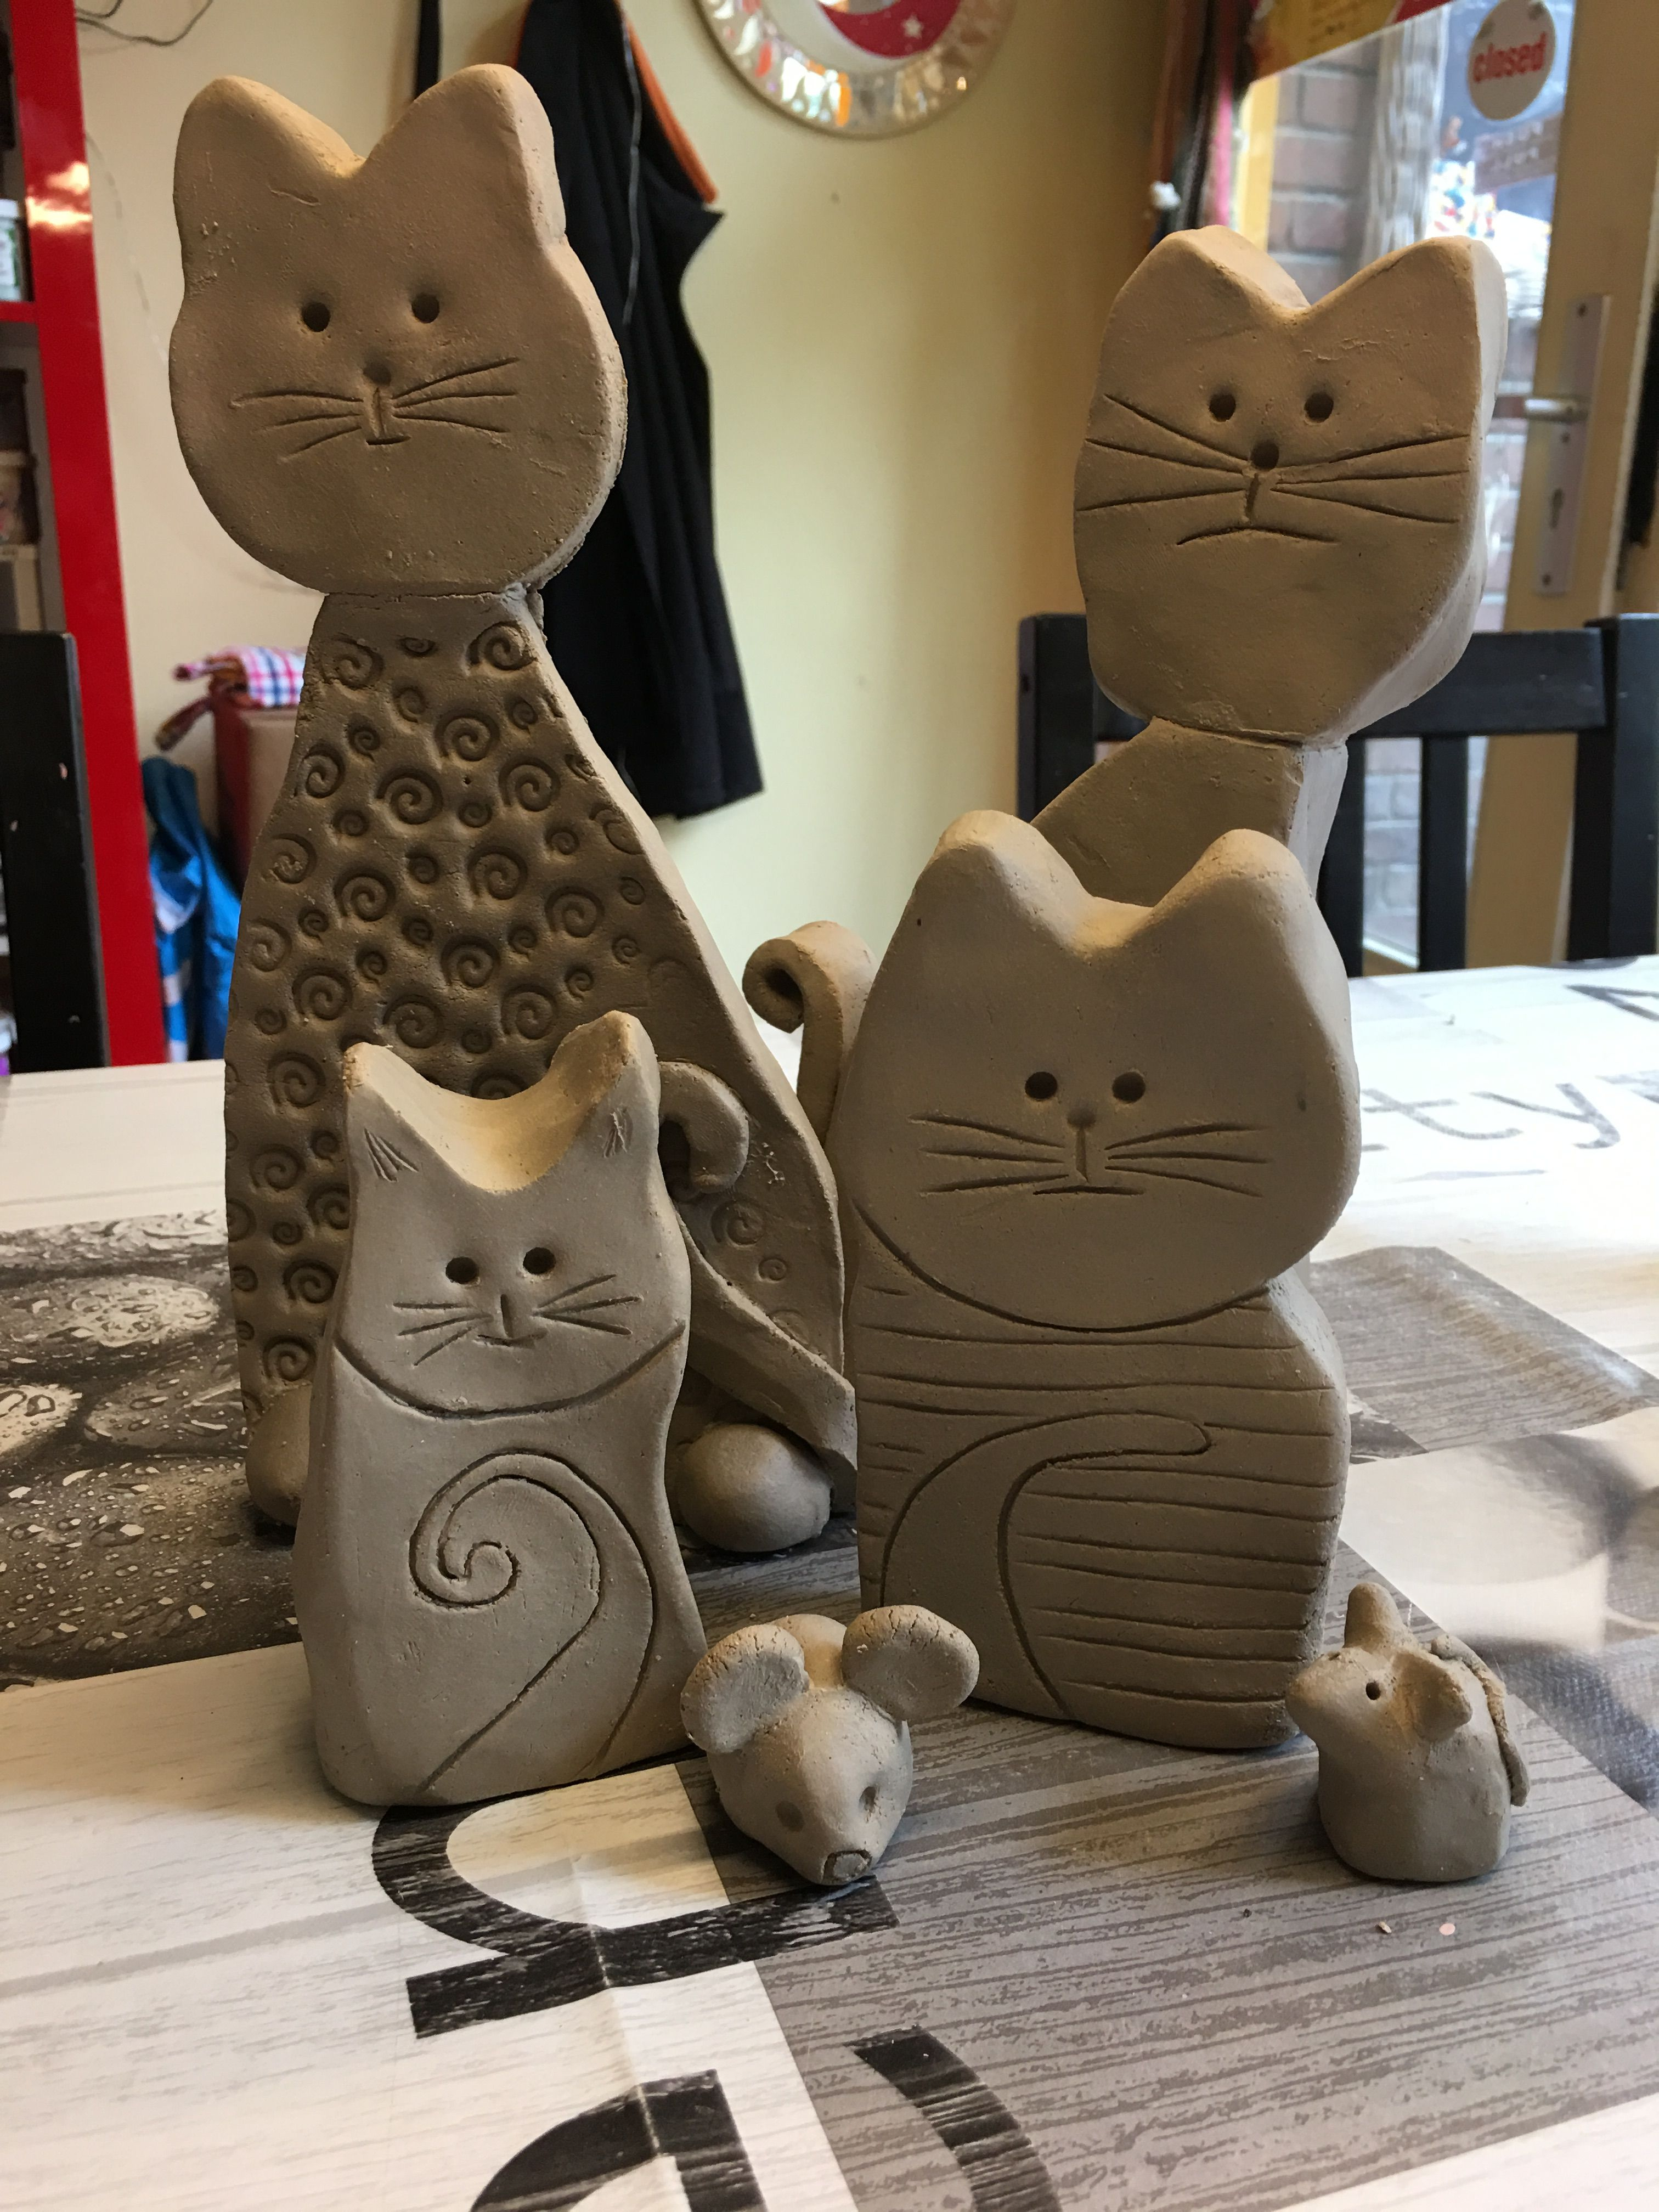 Ceramic Cat Clay Crafts Ceramics Projects Kids Pottery